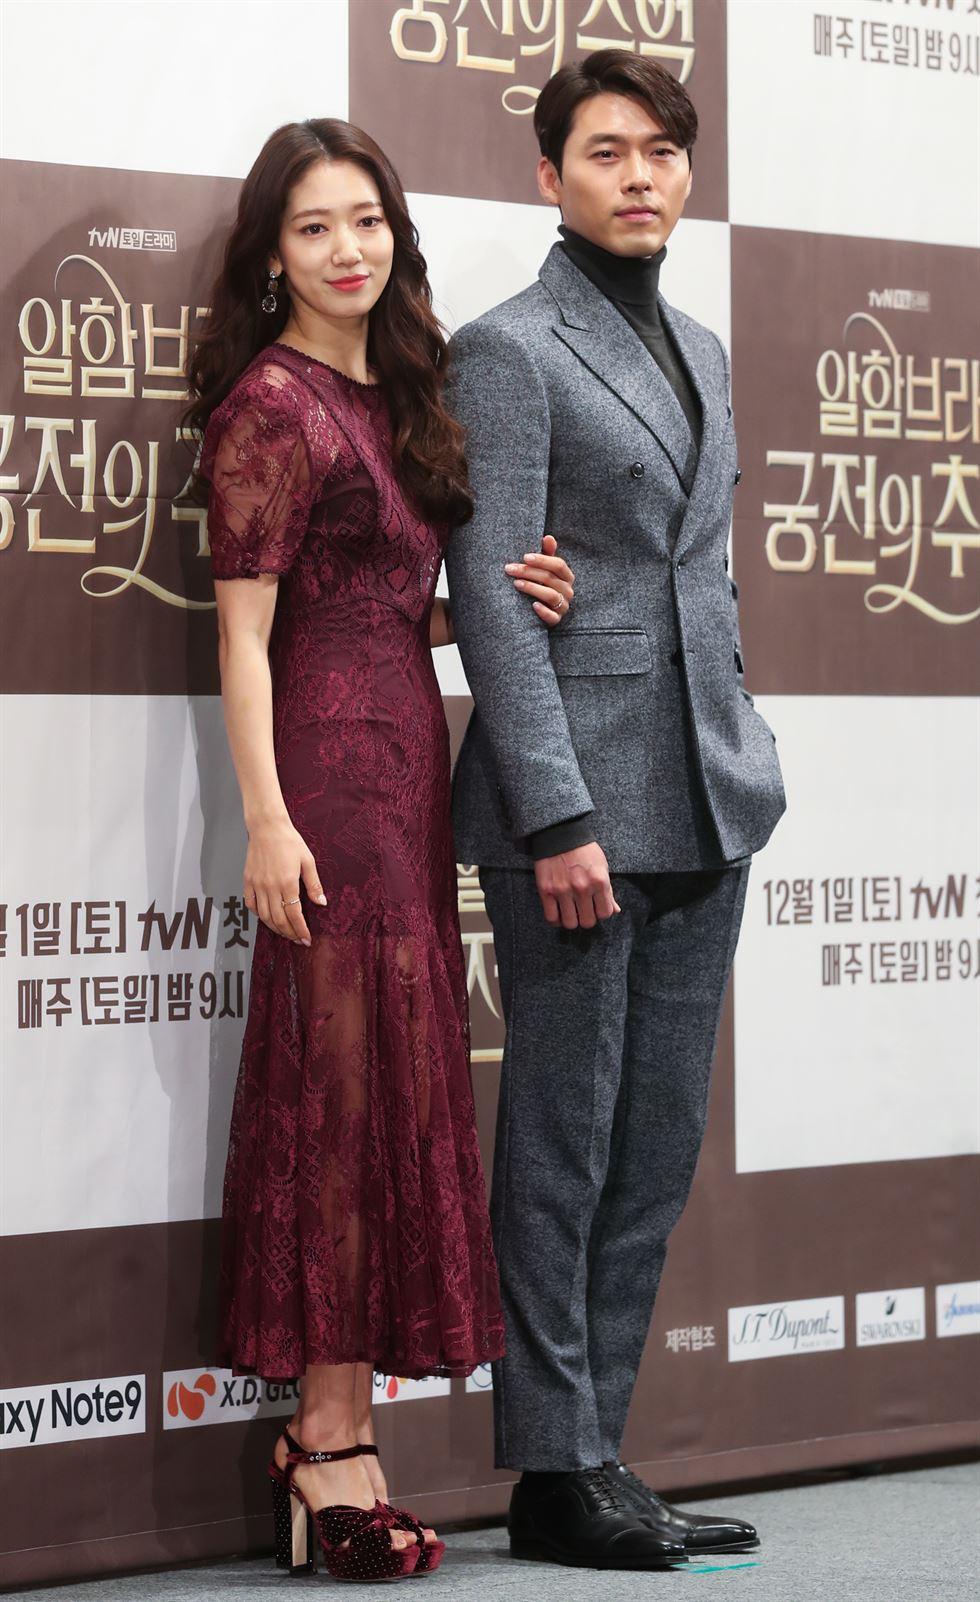 Scenes from tvN's new fantasy drama 'Memories of the Alhambra' / Courtesy of CJ ENM